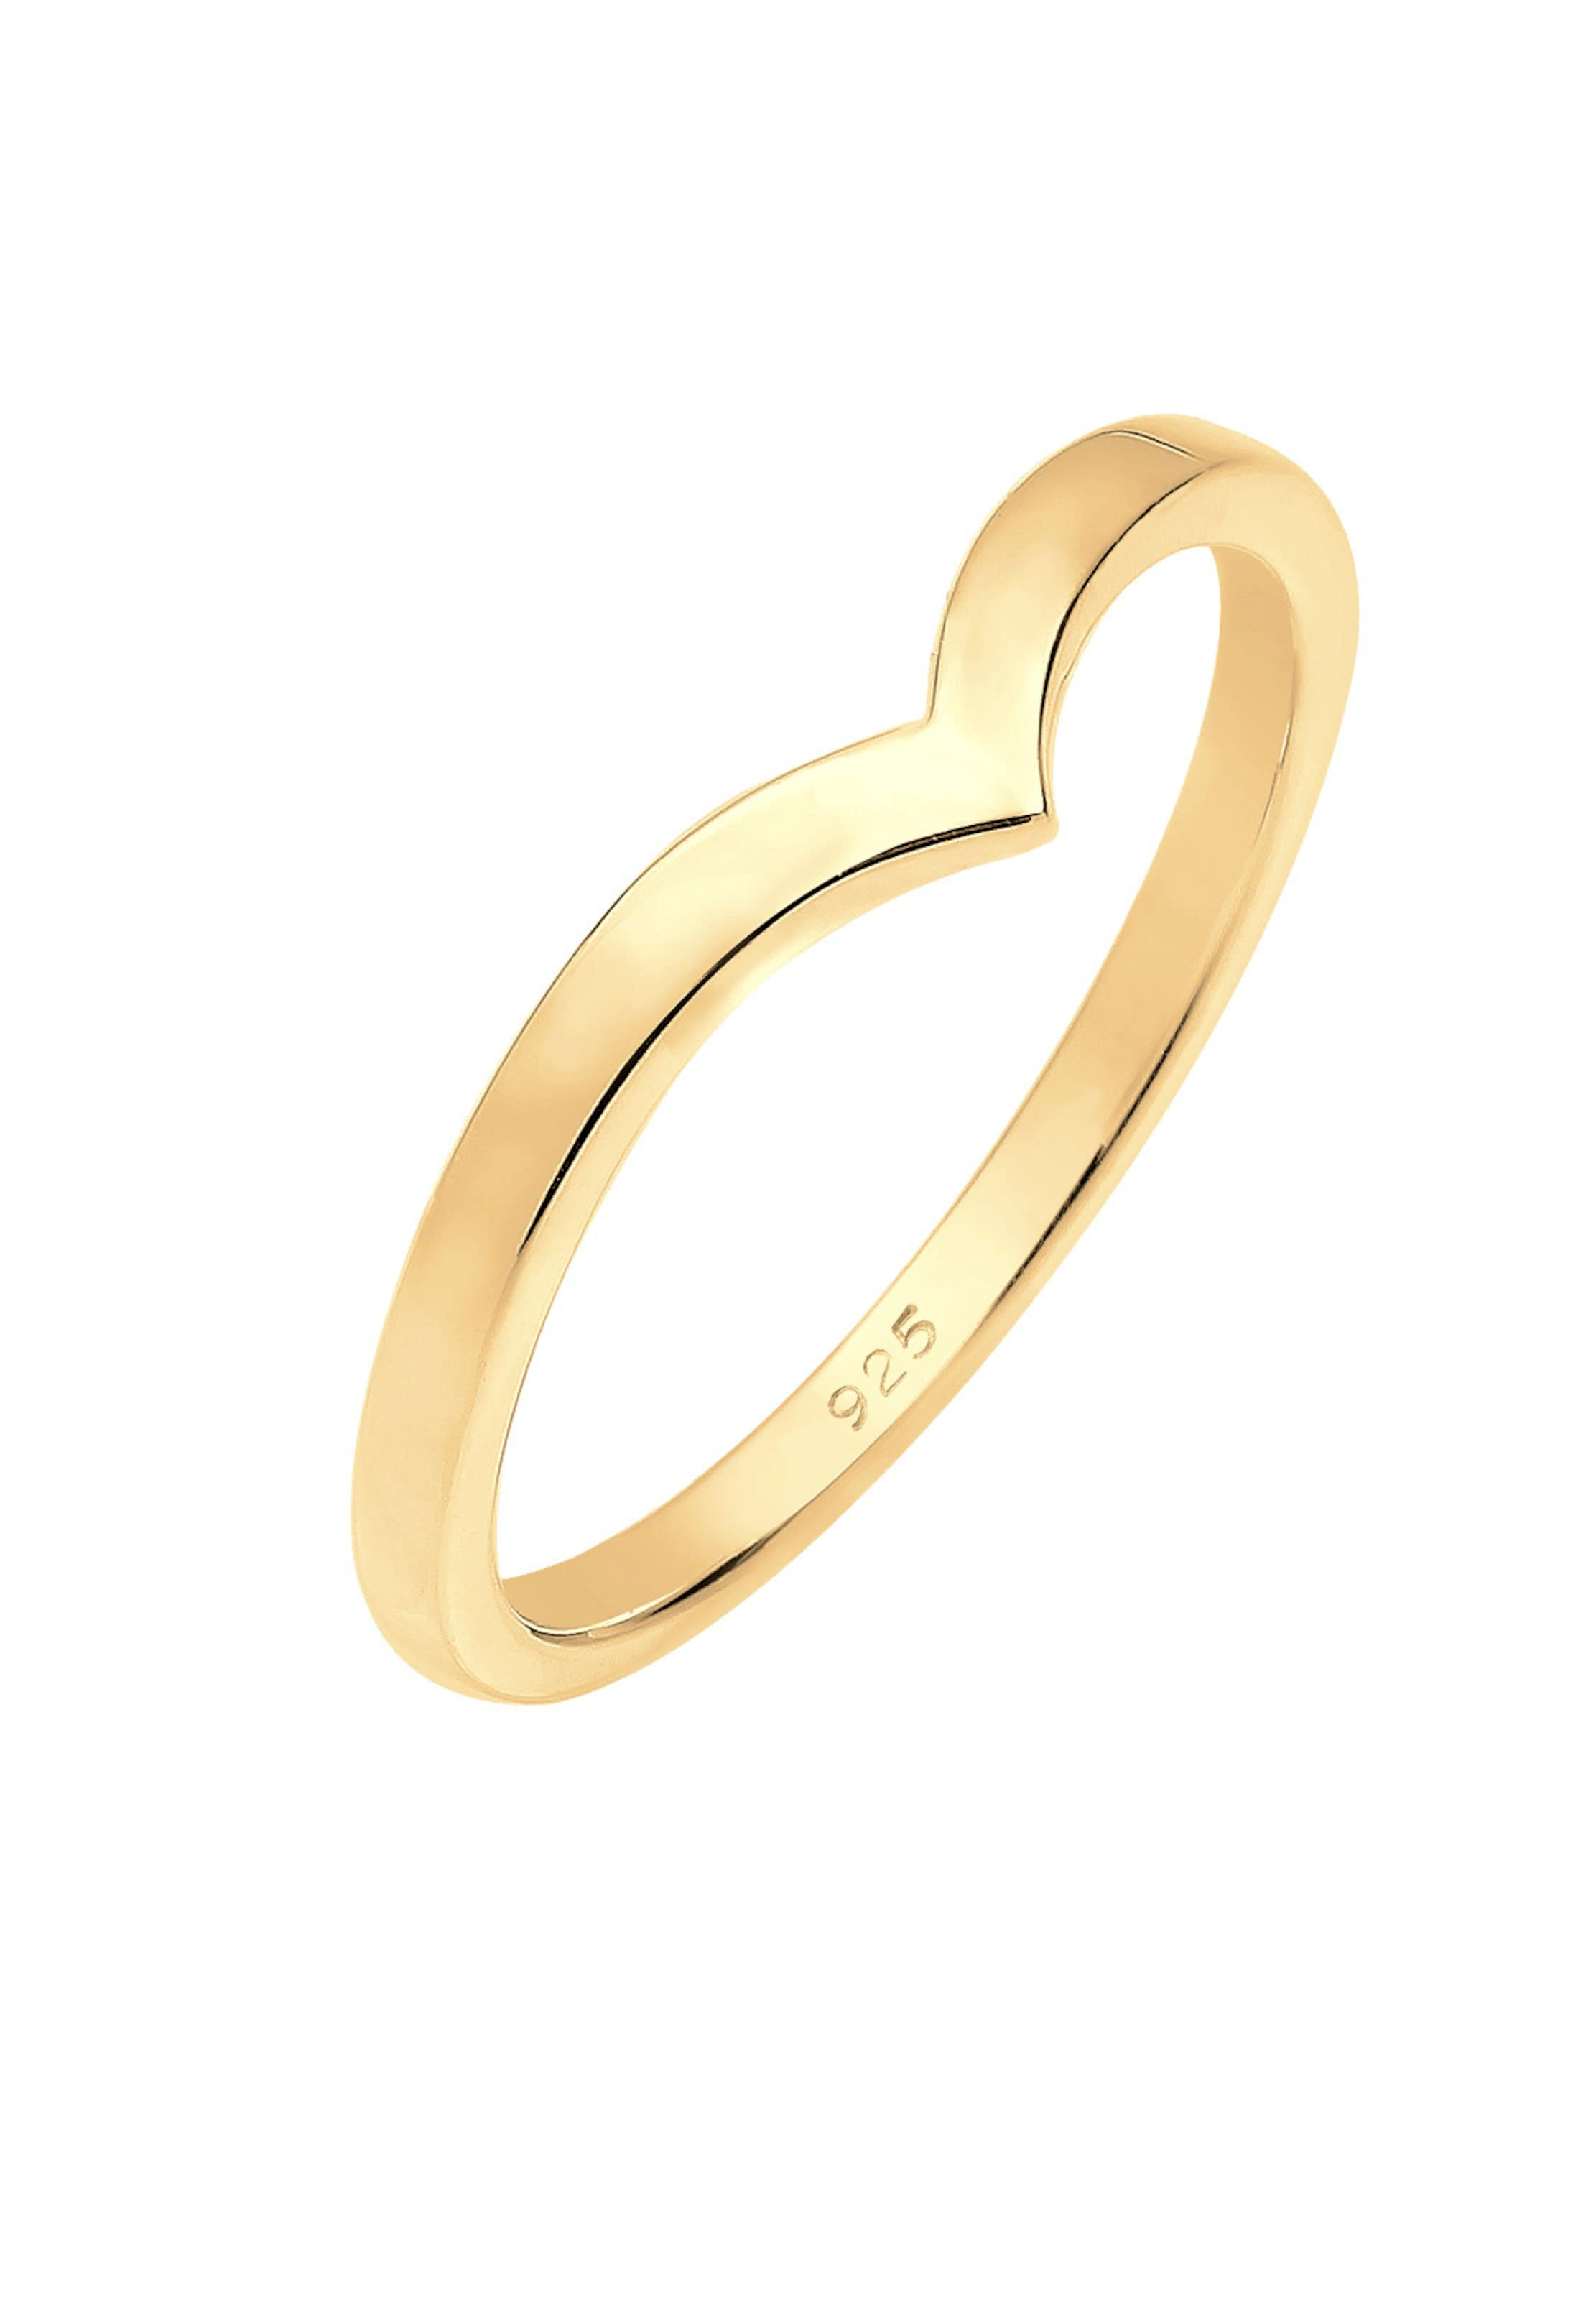 Bandring Gold Elli Elli Bandring 'geo' In kwXlOPuZiT